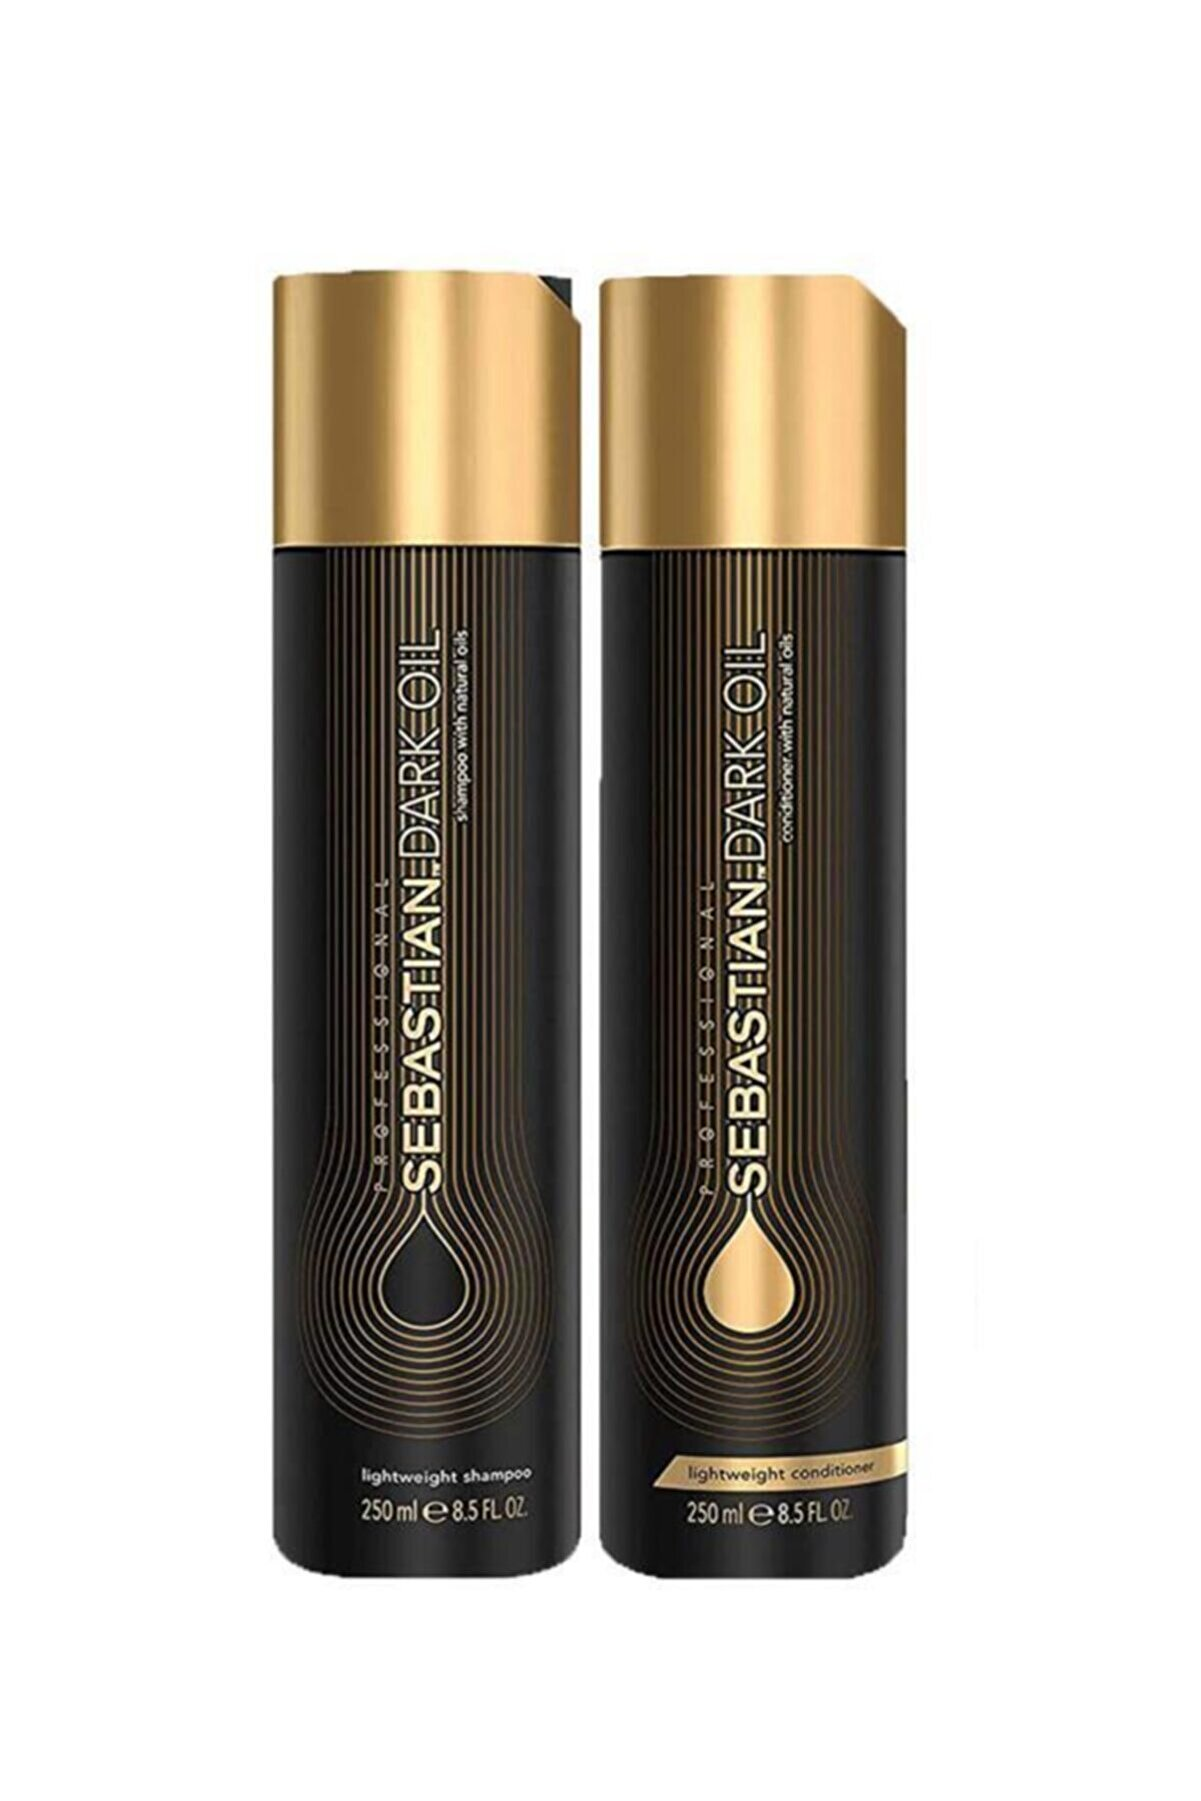 Sebastian Dark Oil Lightweight Şampuan 250 Ml + Saç Kremi 250 Ml